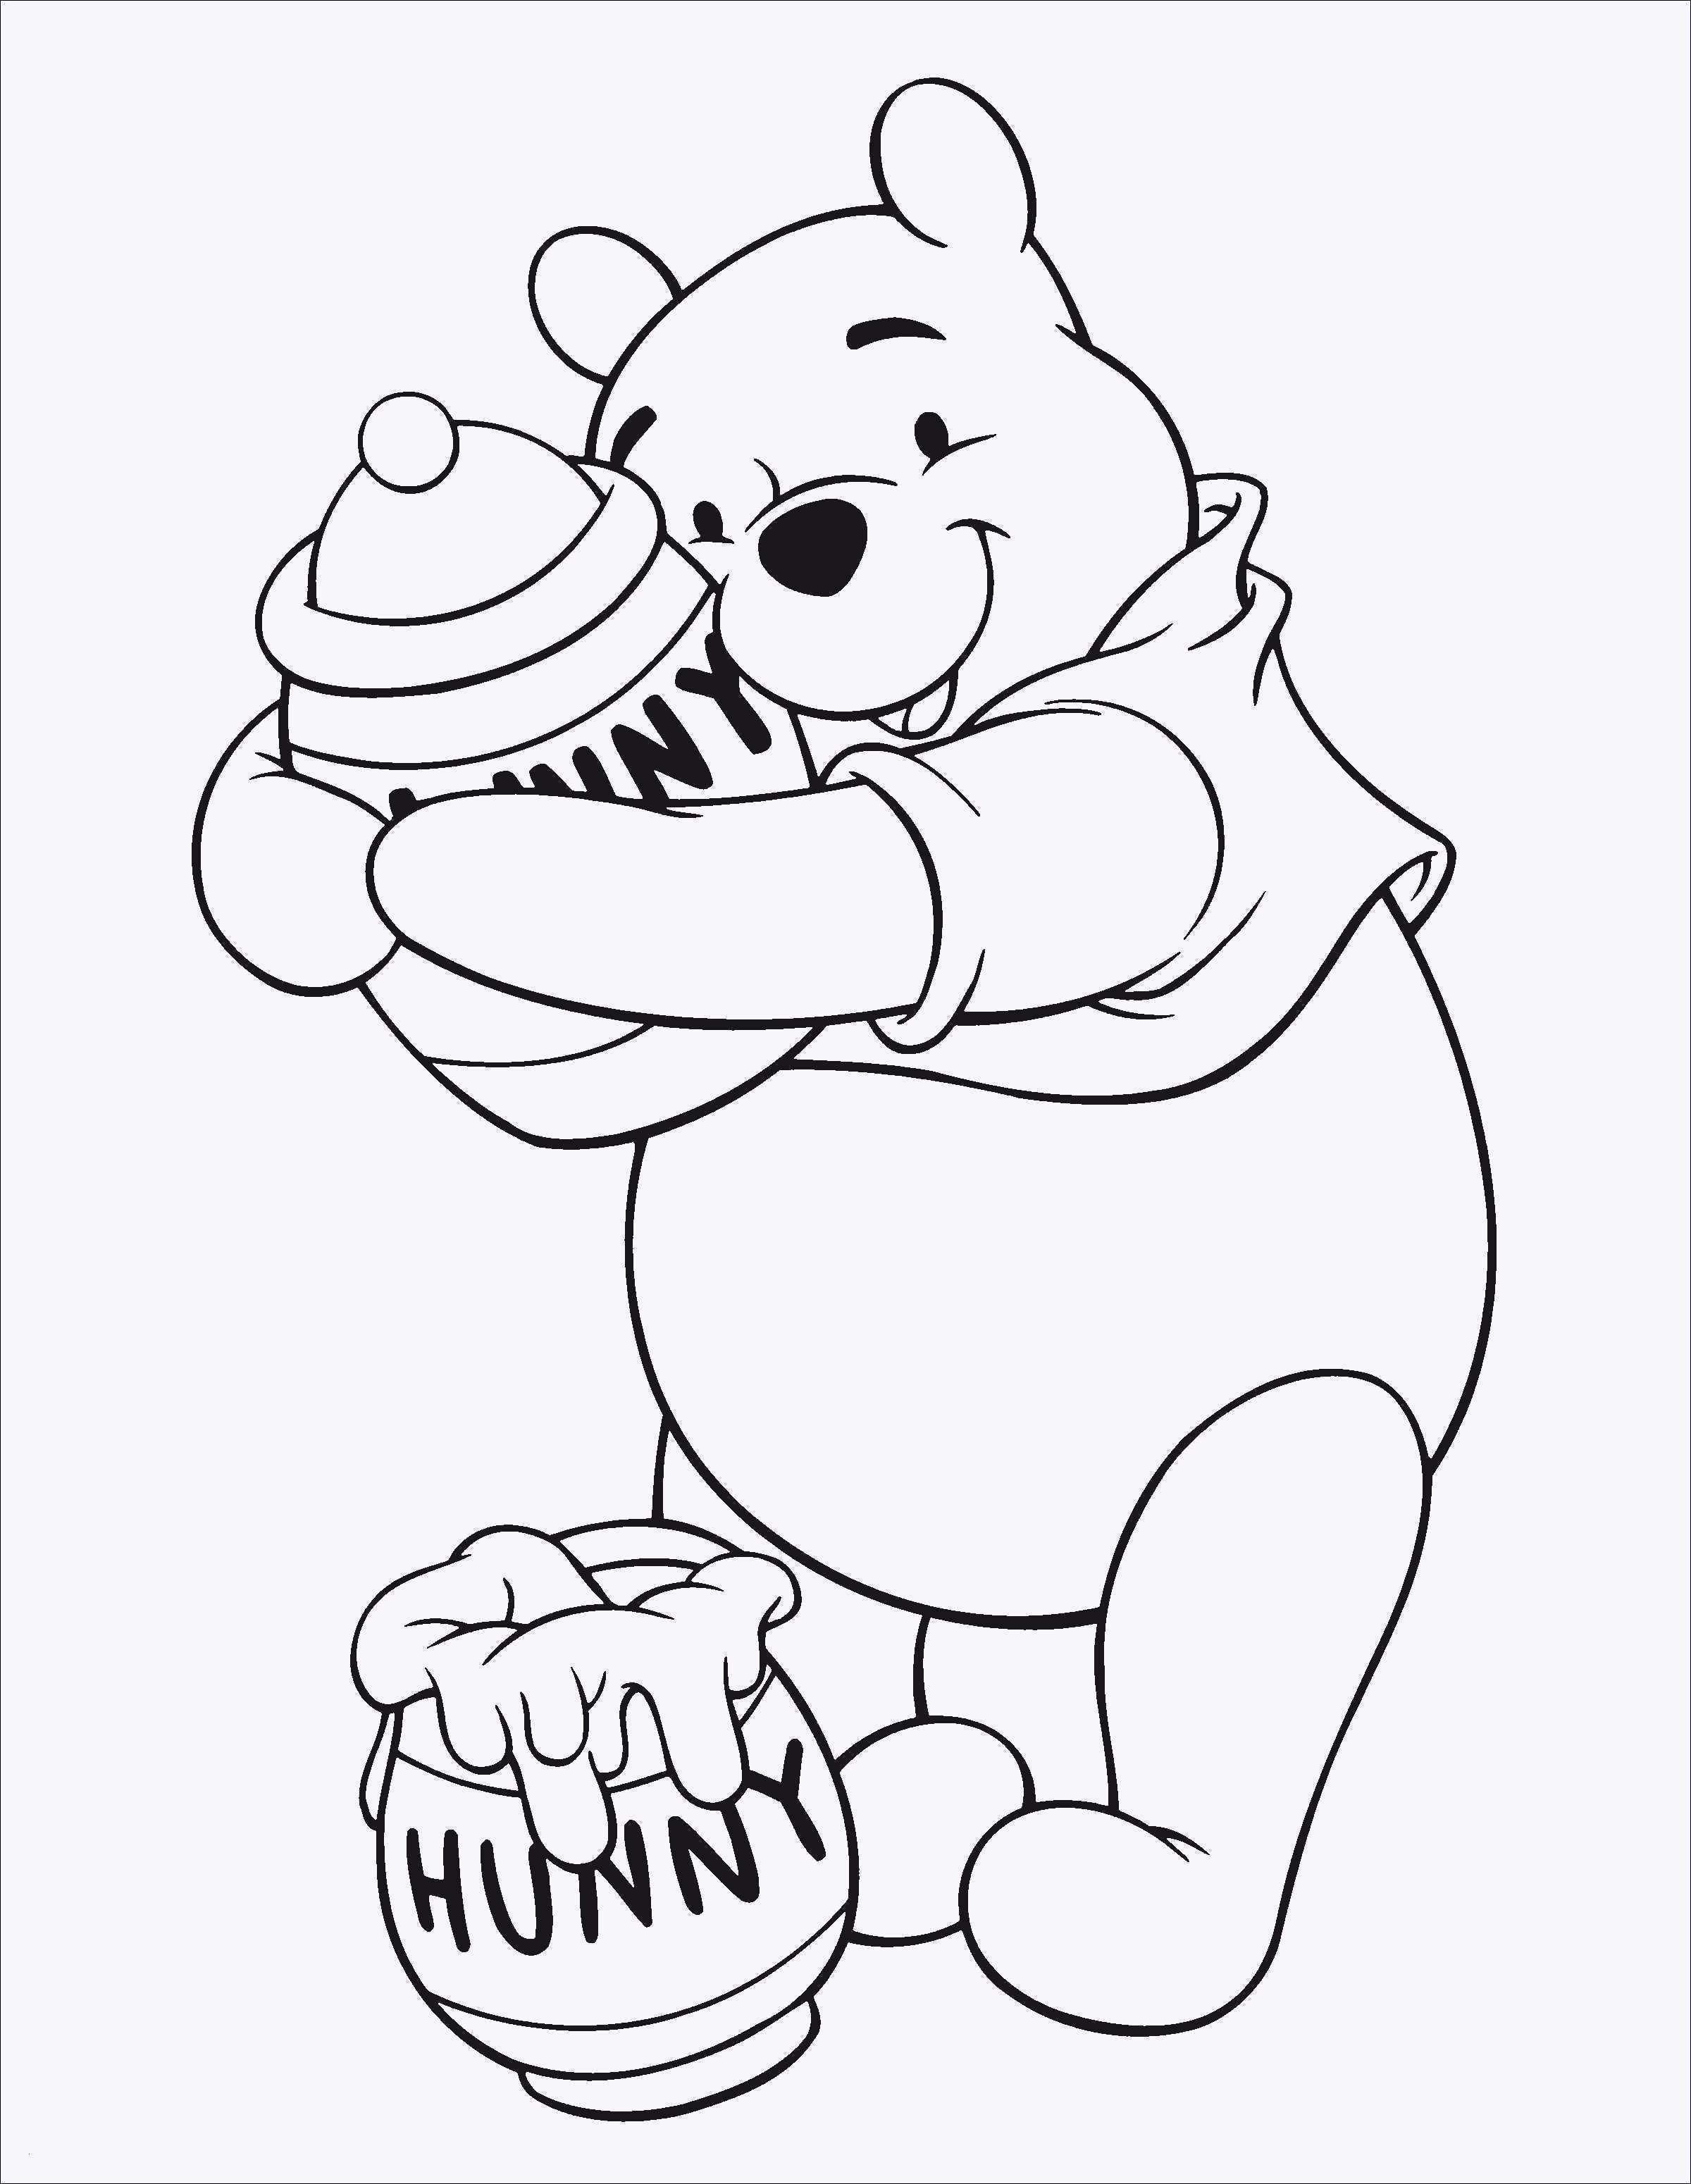 Winni Pooh Ausmalbilder Genial Winnie the Pooh Zum Ausmalen Fotos Ausmalbilder Winnie Pooh Und Stock